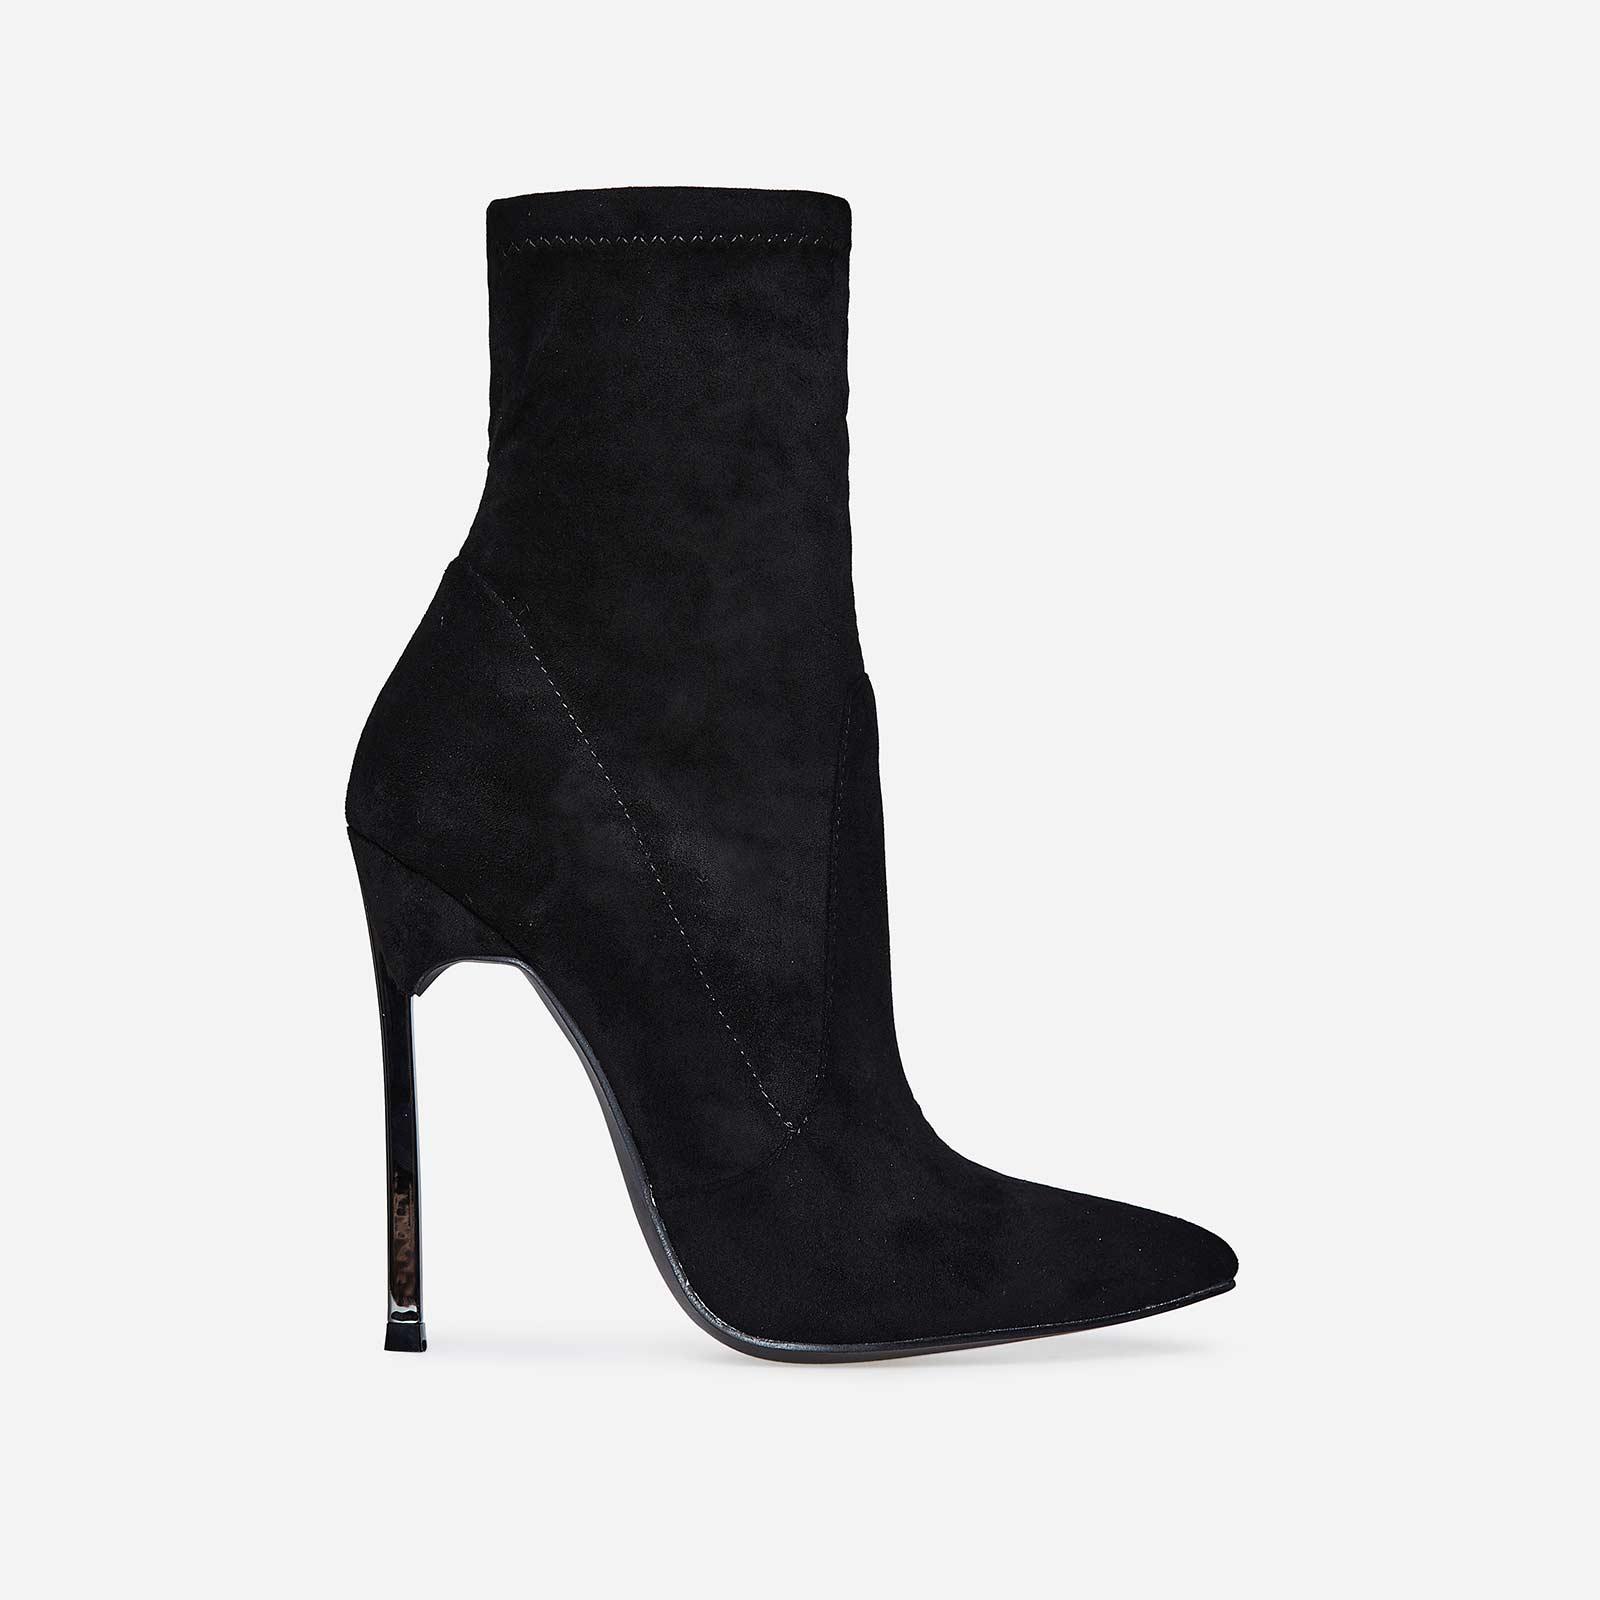 Ava Skinny Heel Pointed Toe Sock Boot In Black Faux Suede